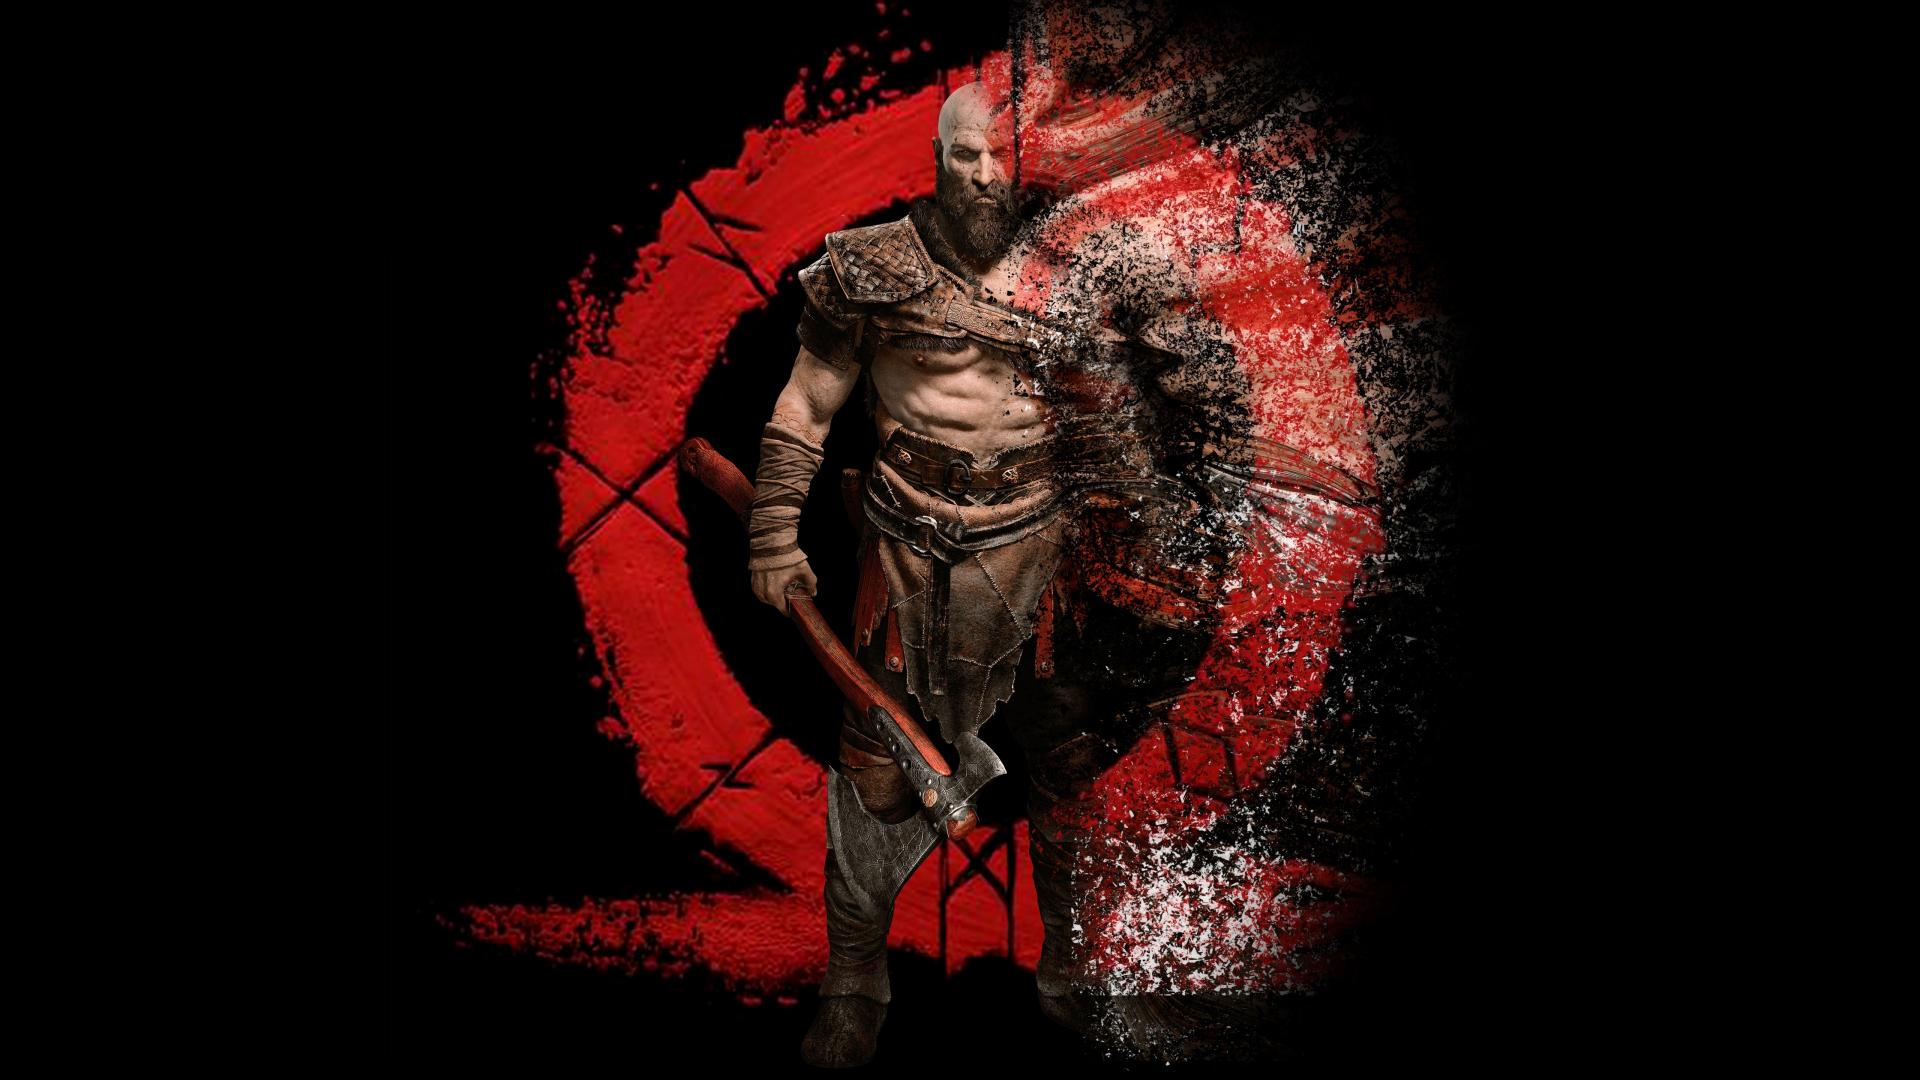 Download 1920x1080 Wallpaper Kratos Warrior Digital Art God Of